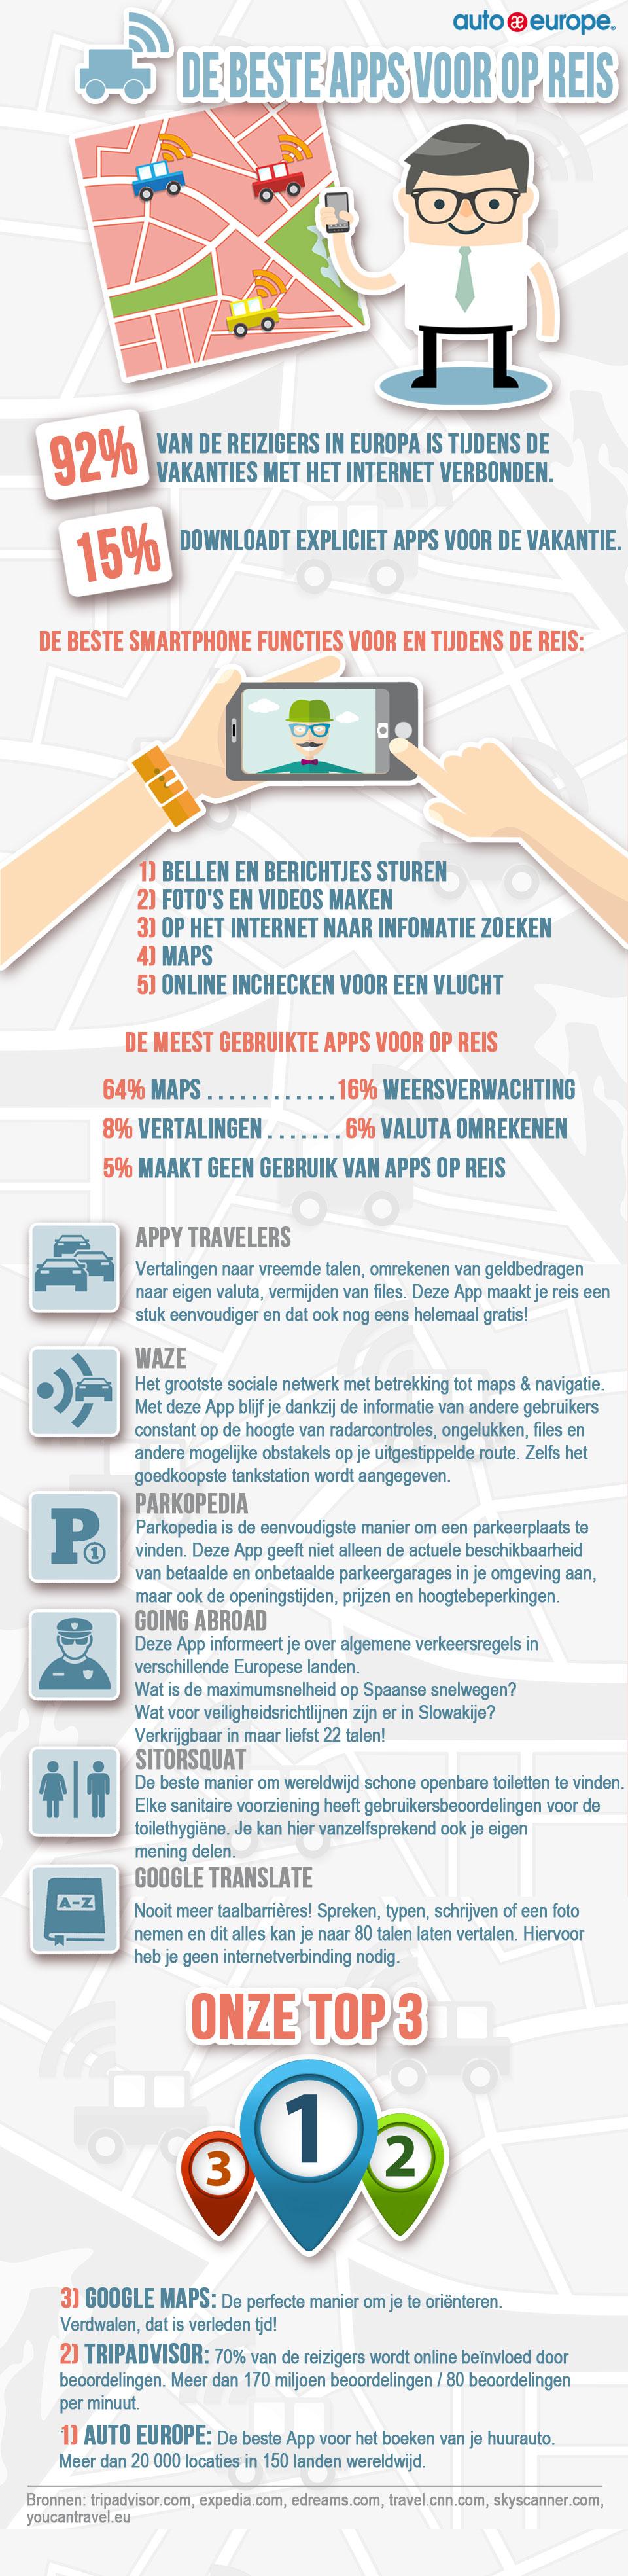 Auto Europe autohuur | De beste reis apps